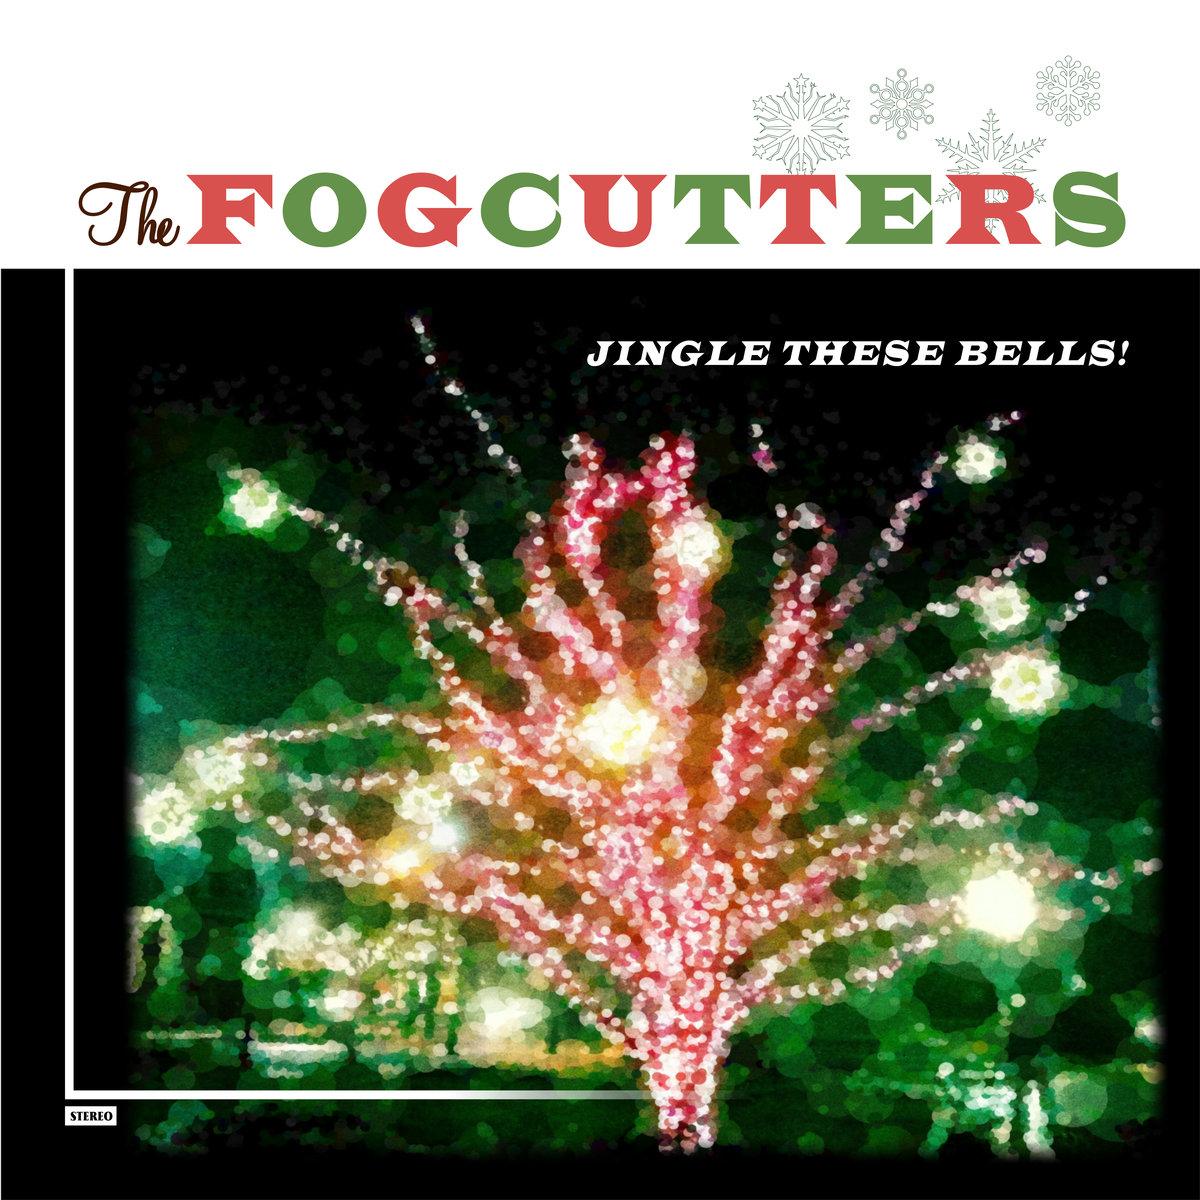 jingle these bells album cover.jpg